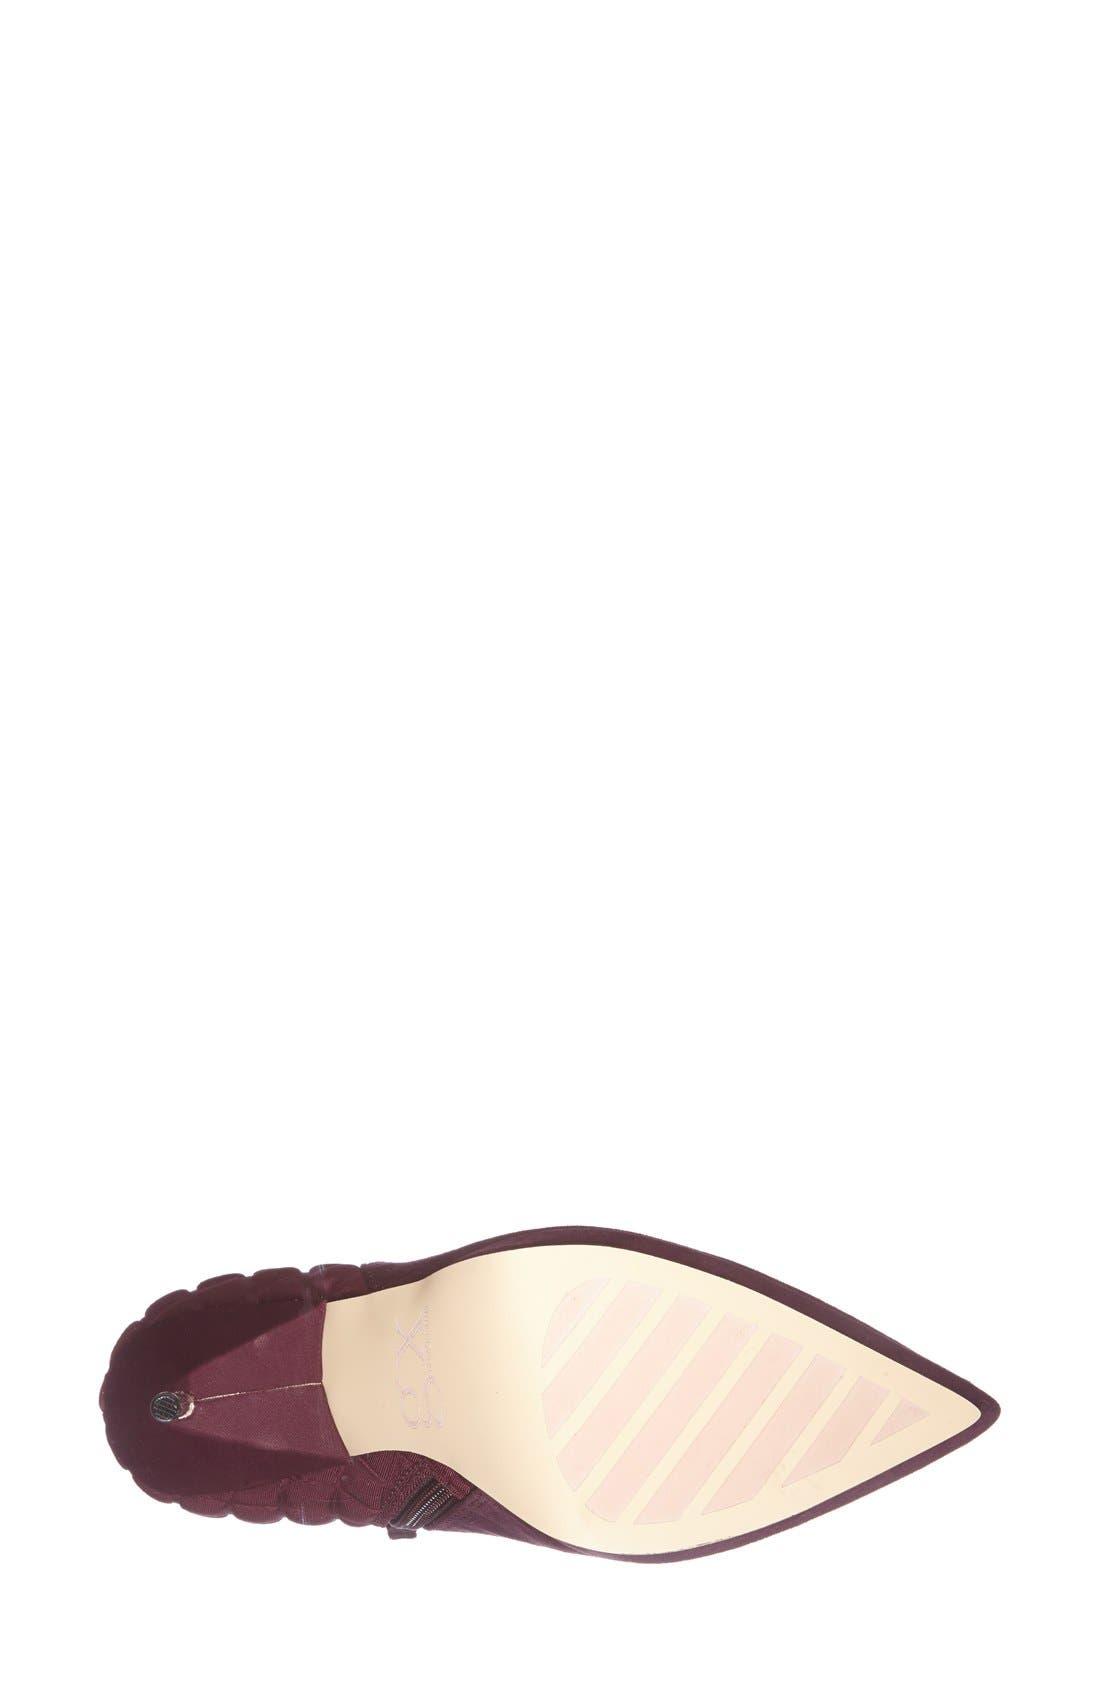 Alternate Image 4  - gx by Gwen Stefani 'Clone' Pointy Toe Platform Bootie (Women)